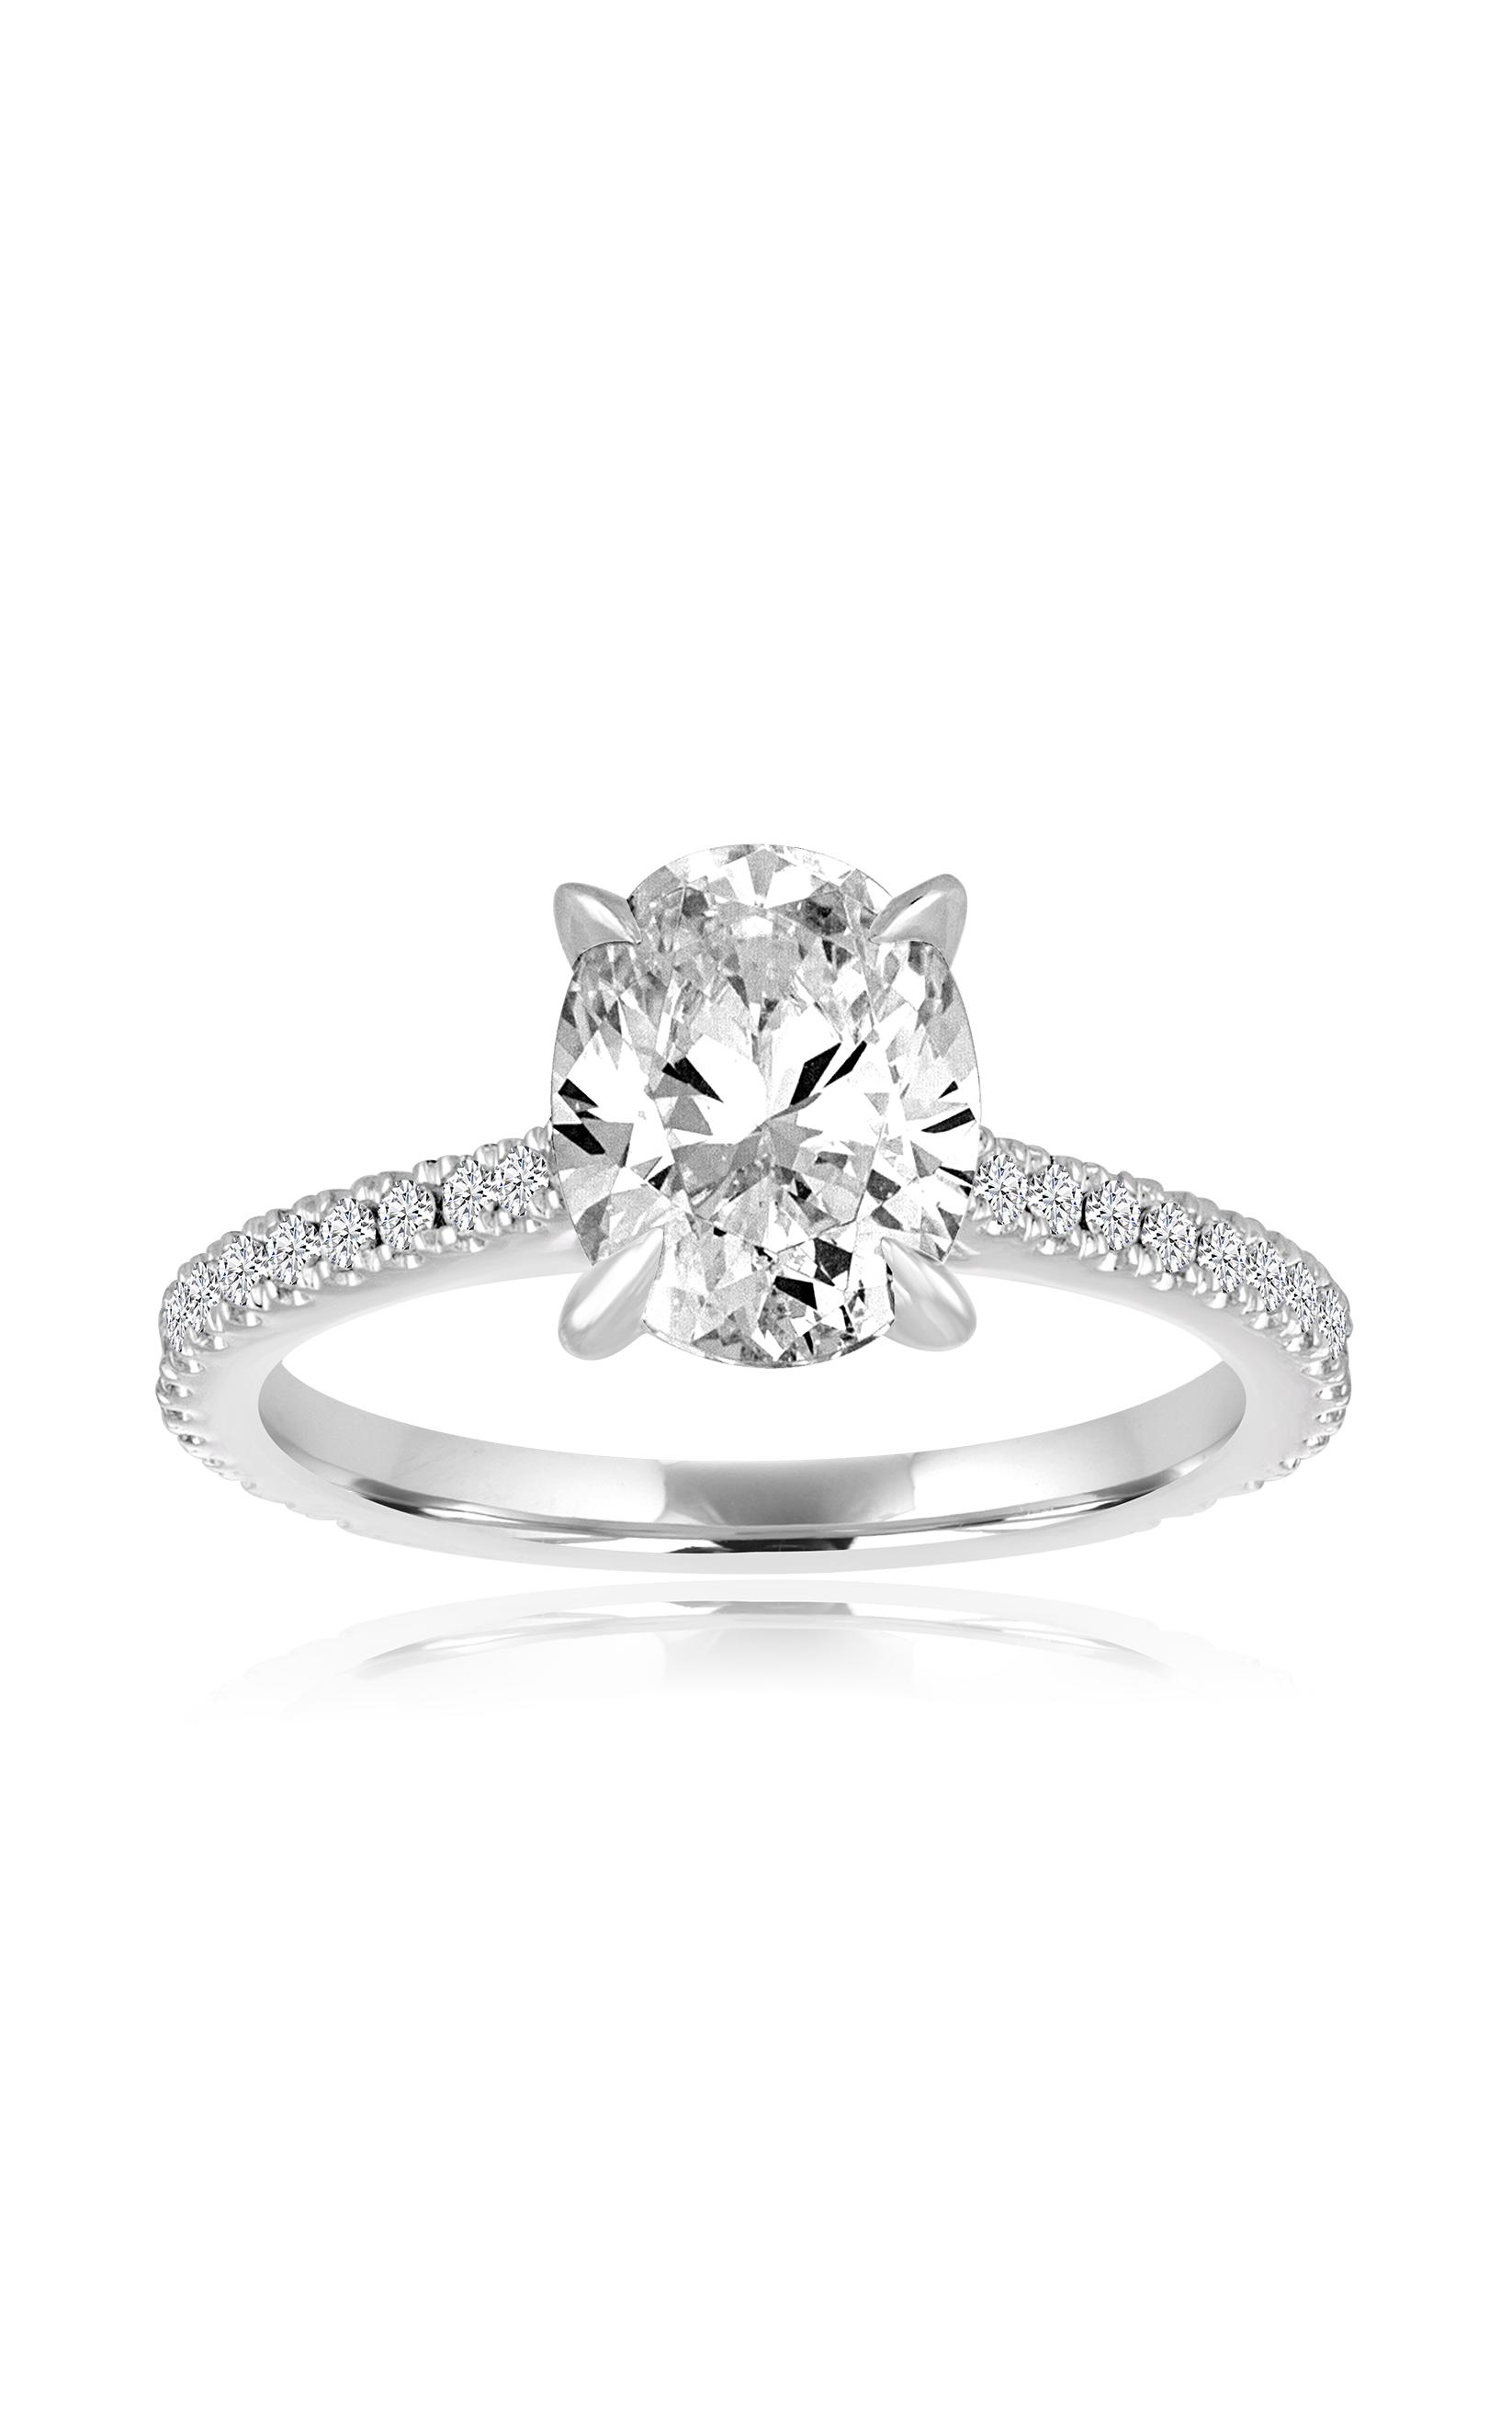 Imagine Bridal Engagement Ring 60346D-1/4 product image